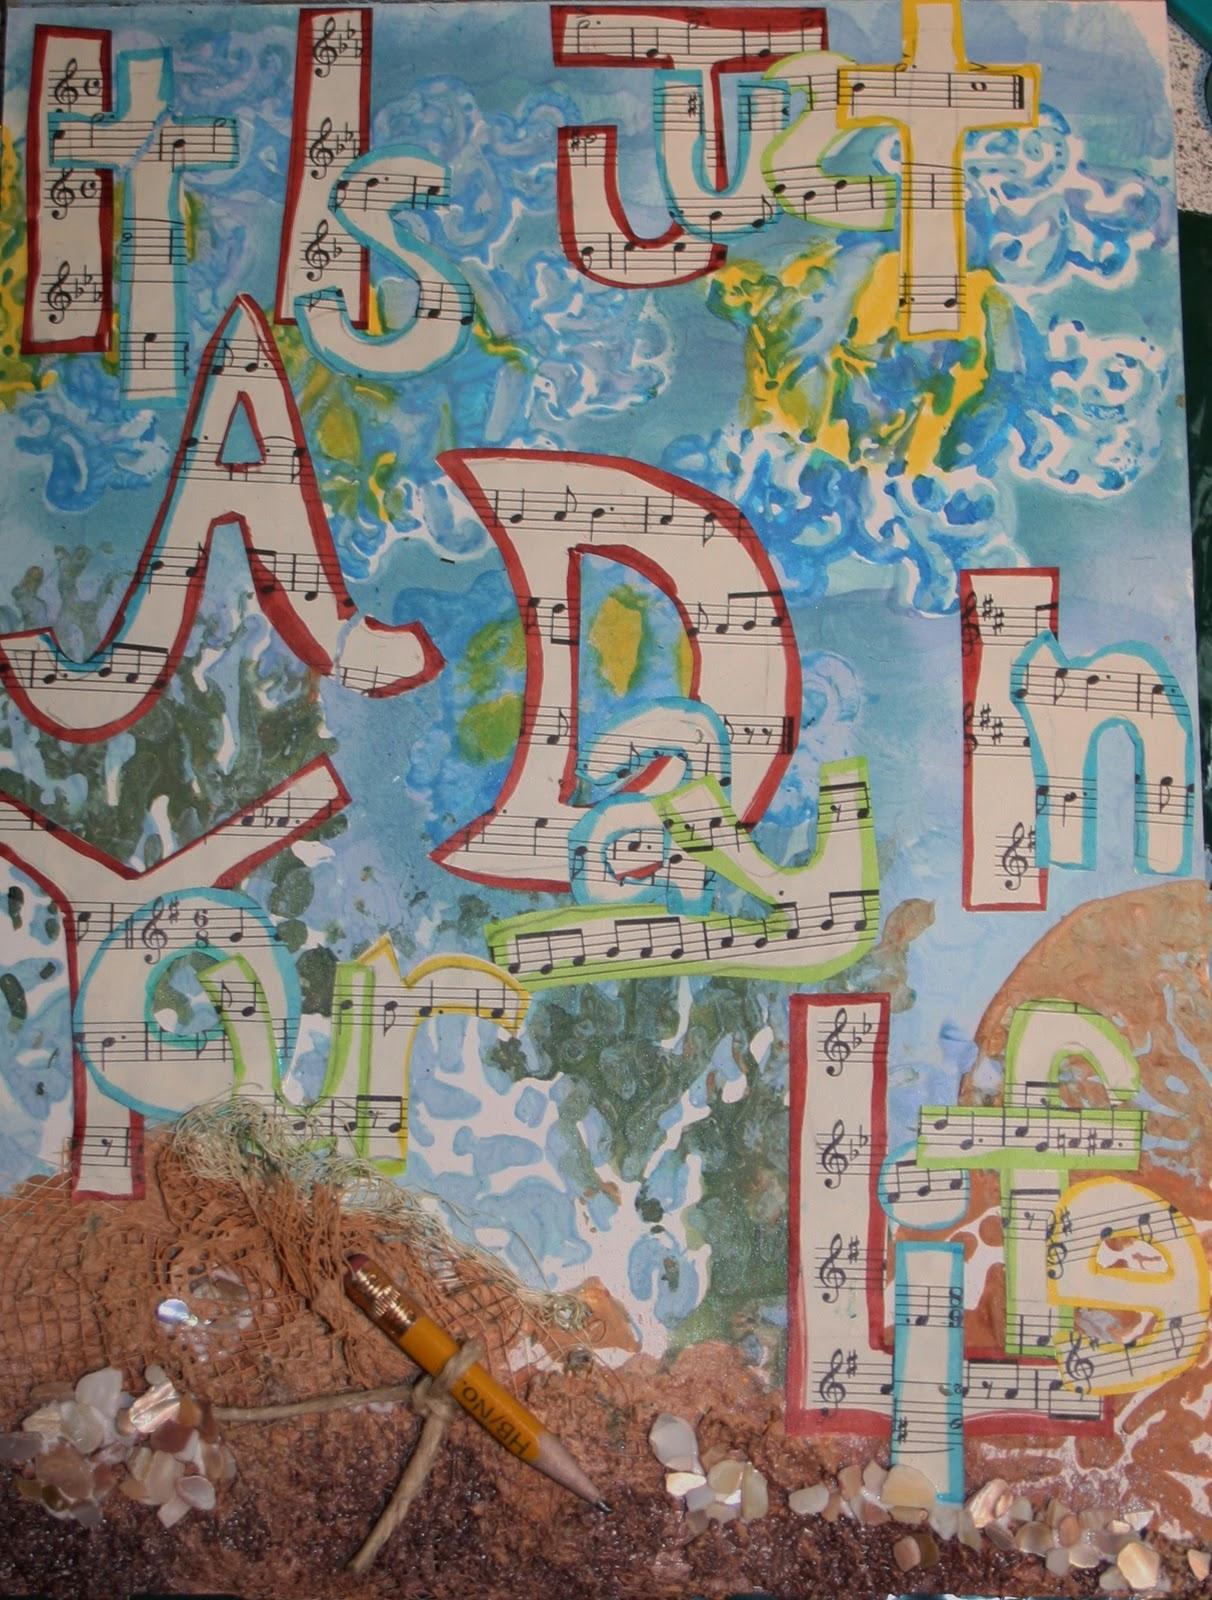 FAIRY ROCKS and THINGS: Free Art Journal Workshop